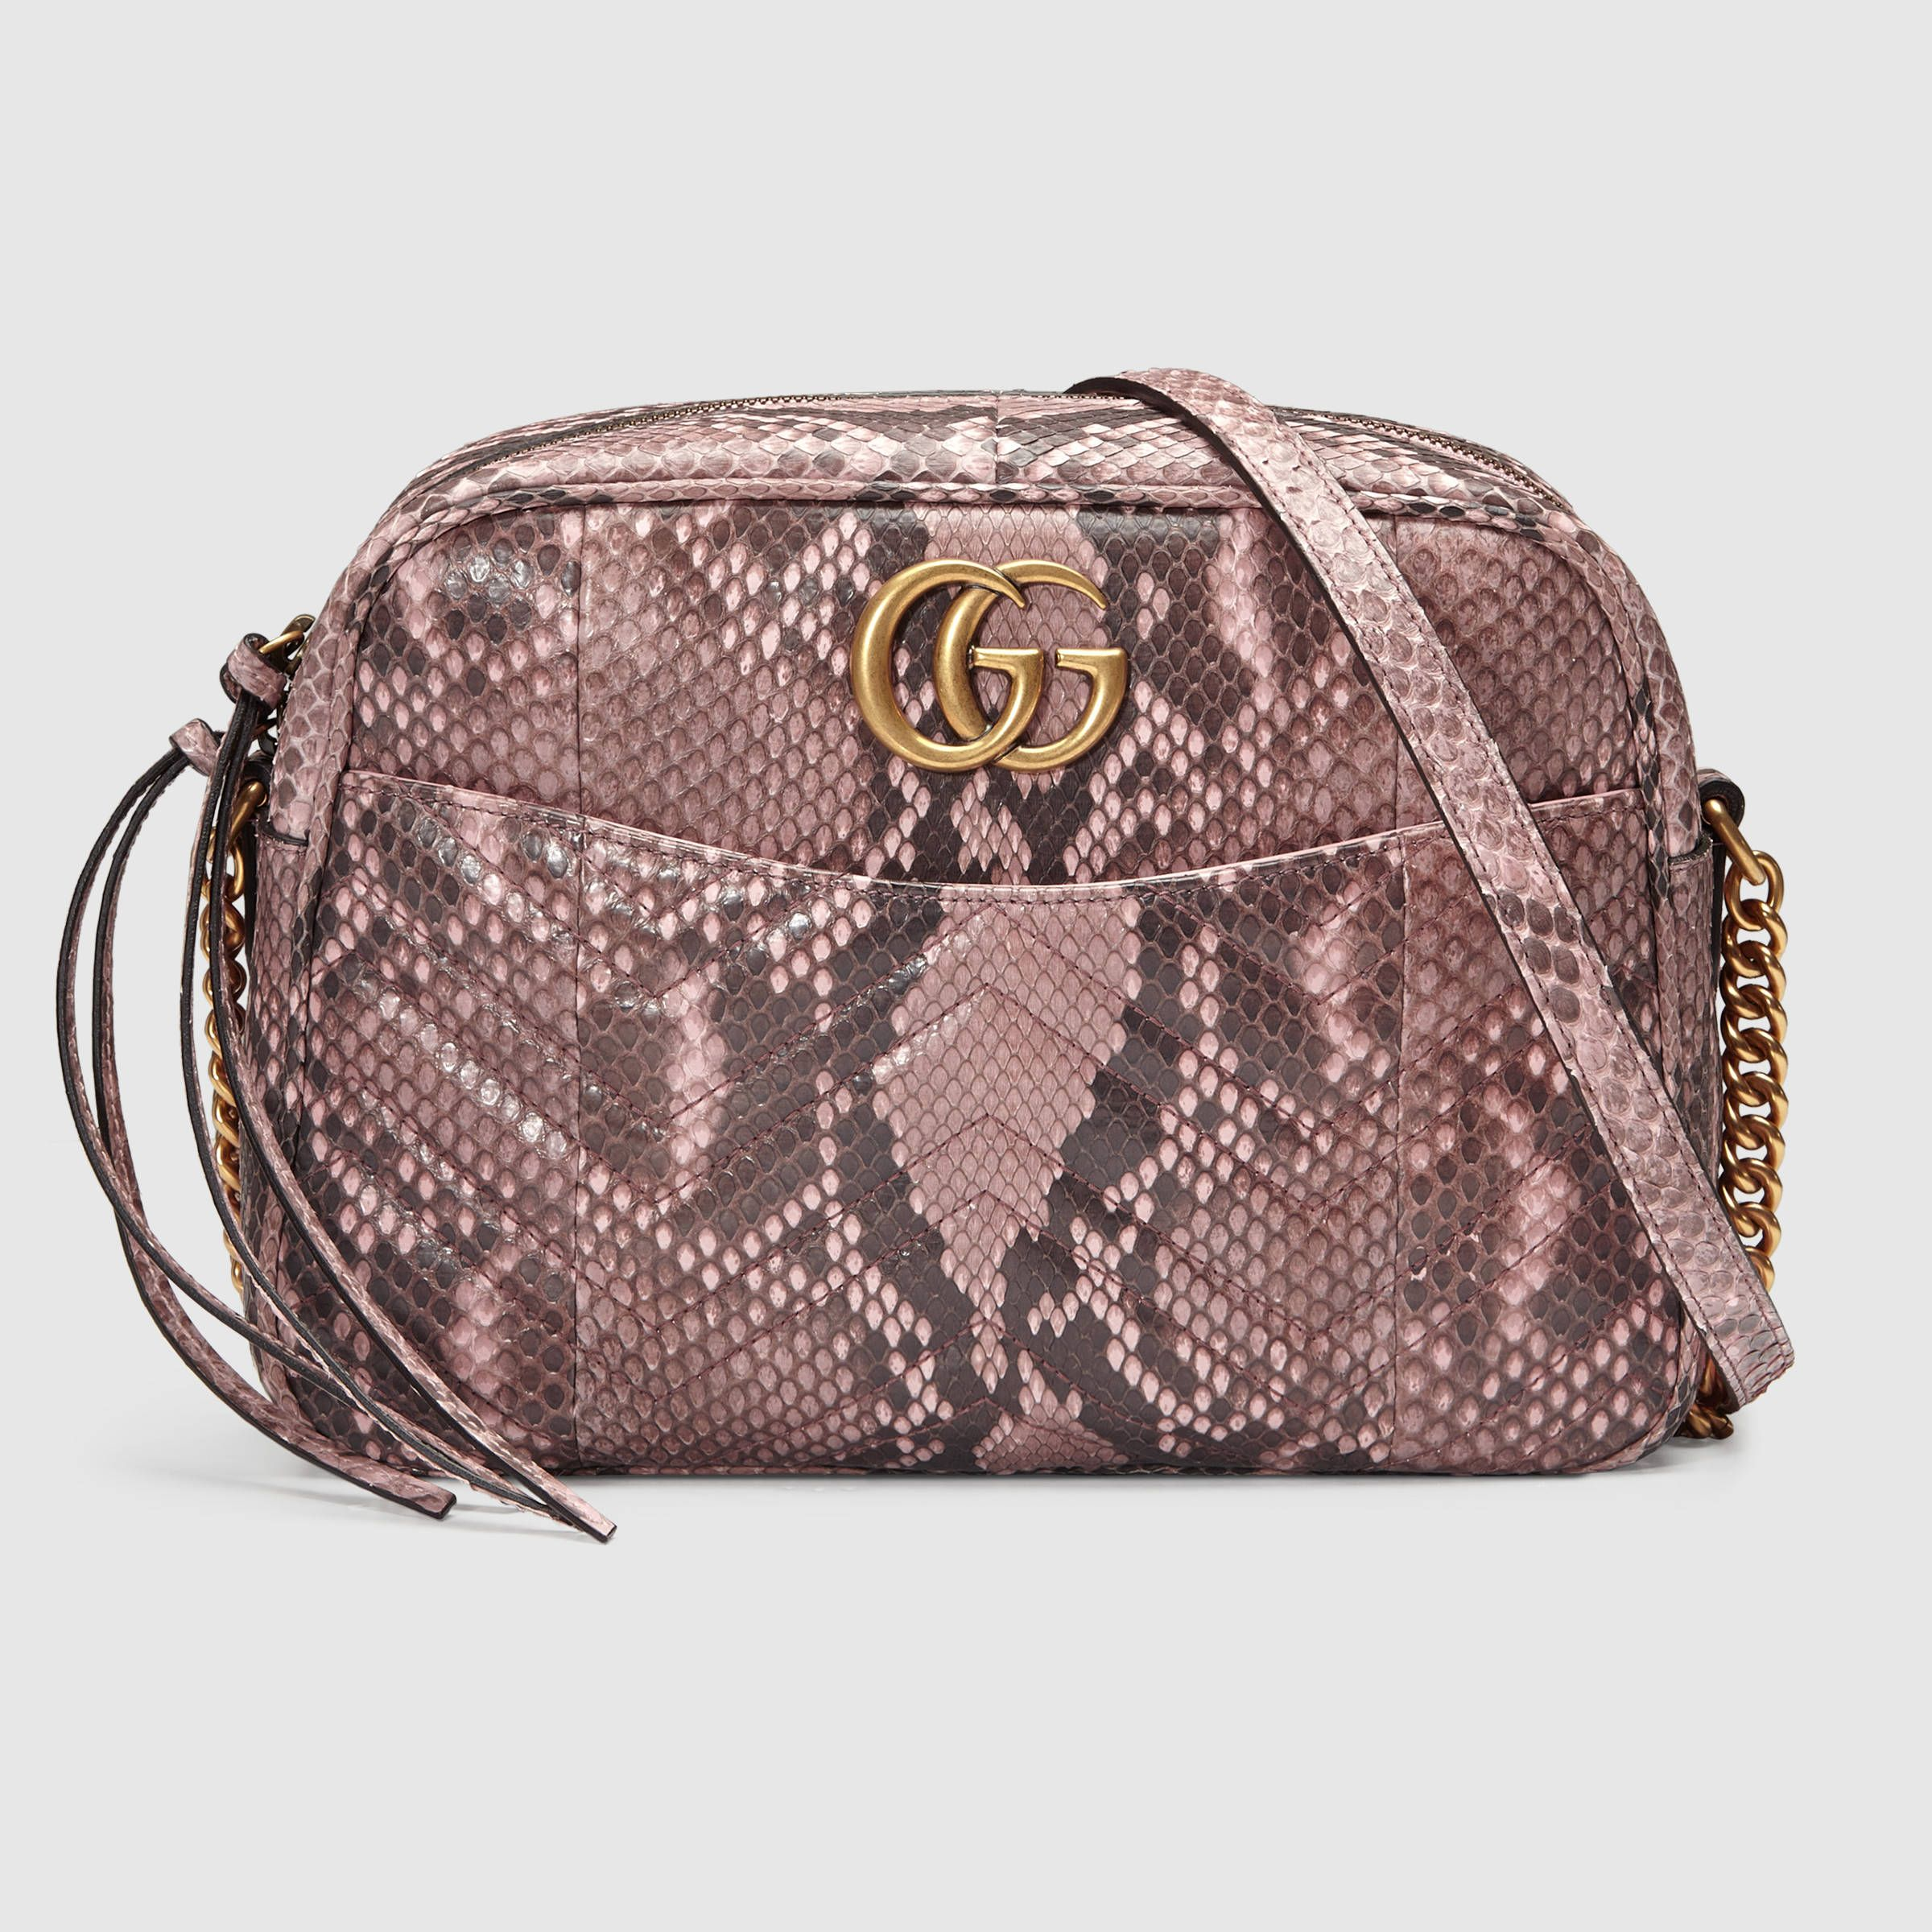 25b3c6f2d GG Marmont medium python shoulder bag | I wish in 2019 | Bags, Gucci ...